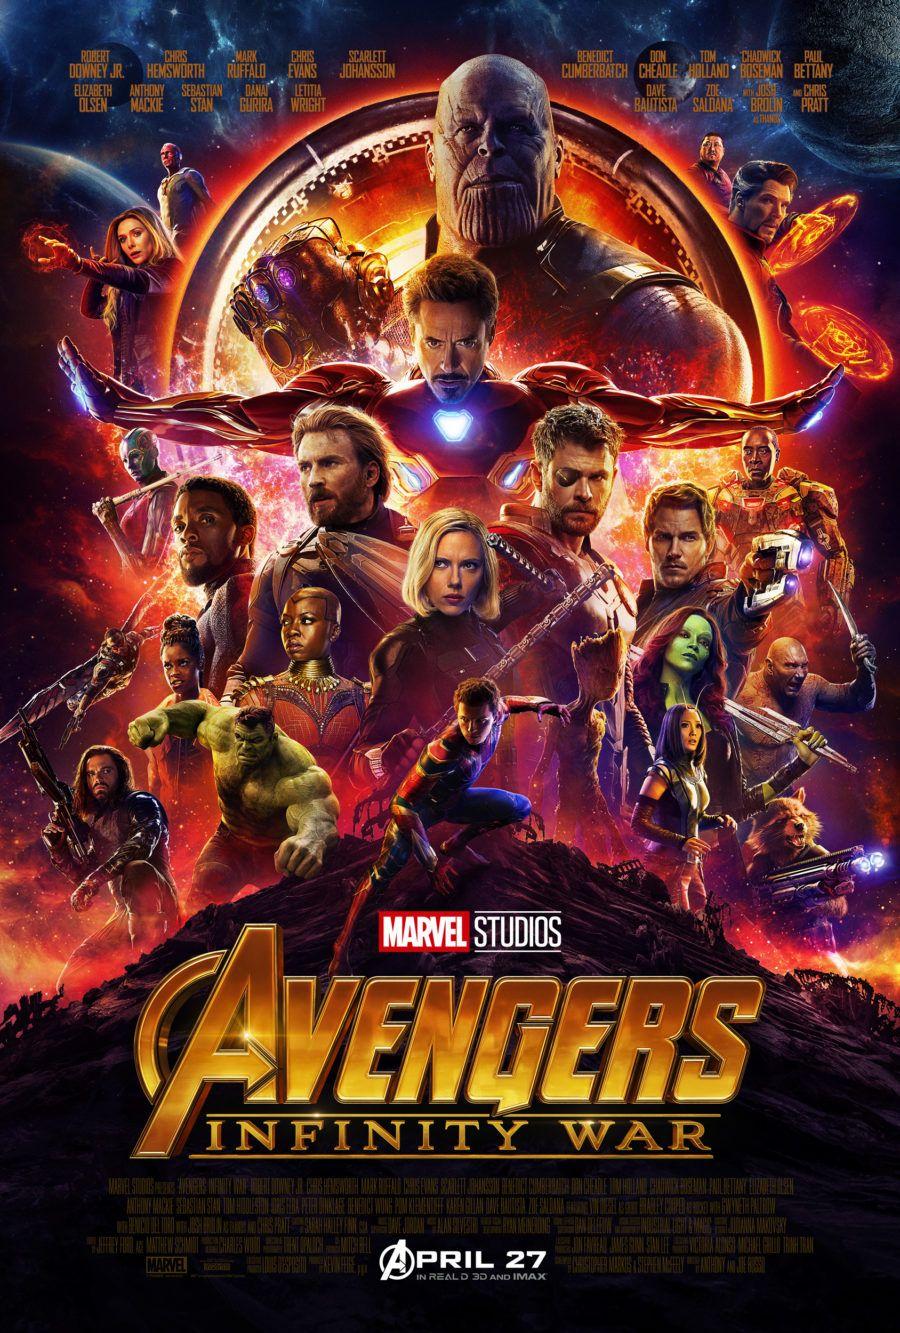 Marvel Studios Releases Avengers Infinity War Poster And Trailer Infinitywar Avengersinfinitywar Infinitywarevent Avengers Movies Marvel Cinematic Avengers Infinity War